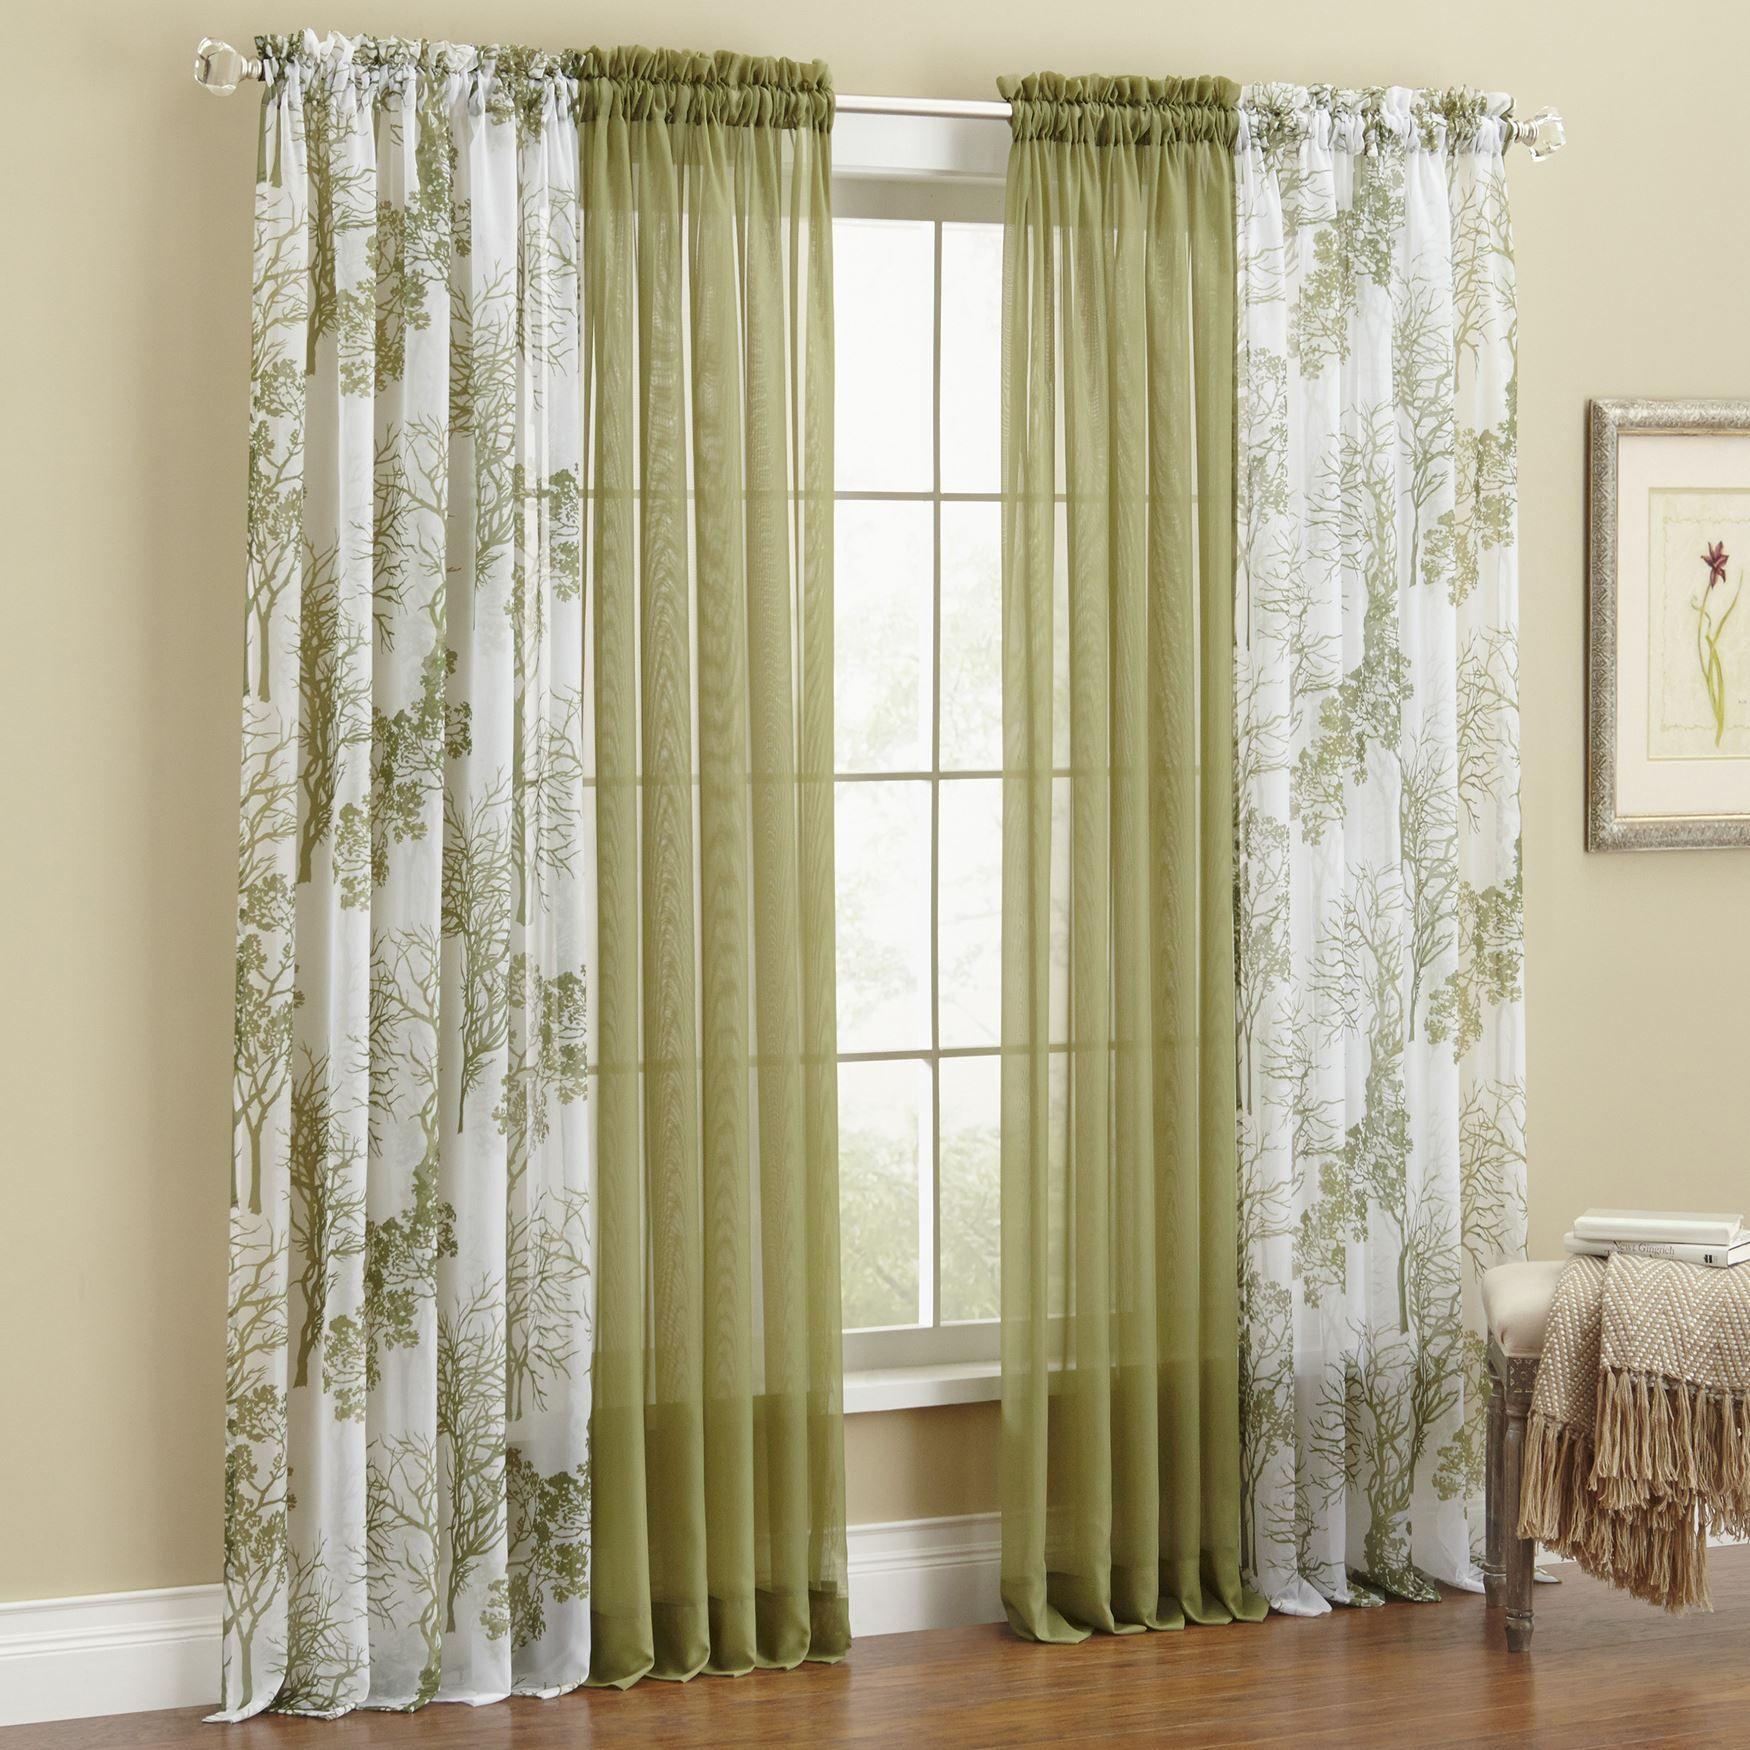 Printed Leaf Sheer Voile Rod-Pocket Curtain